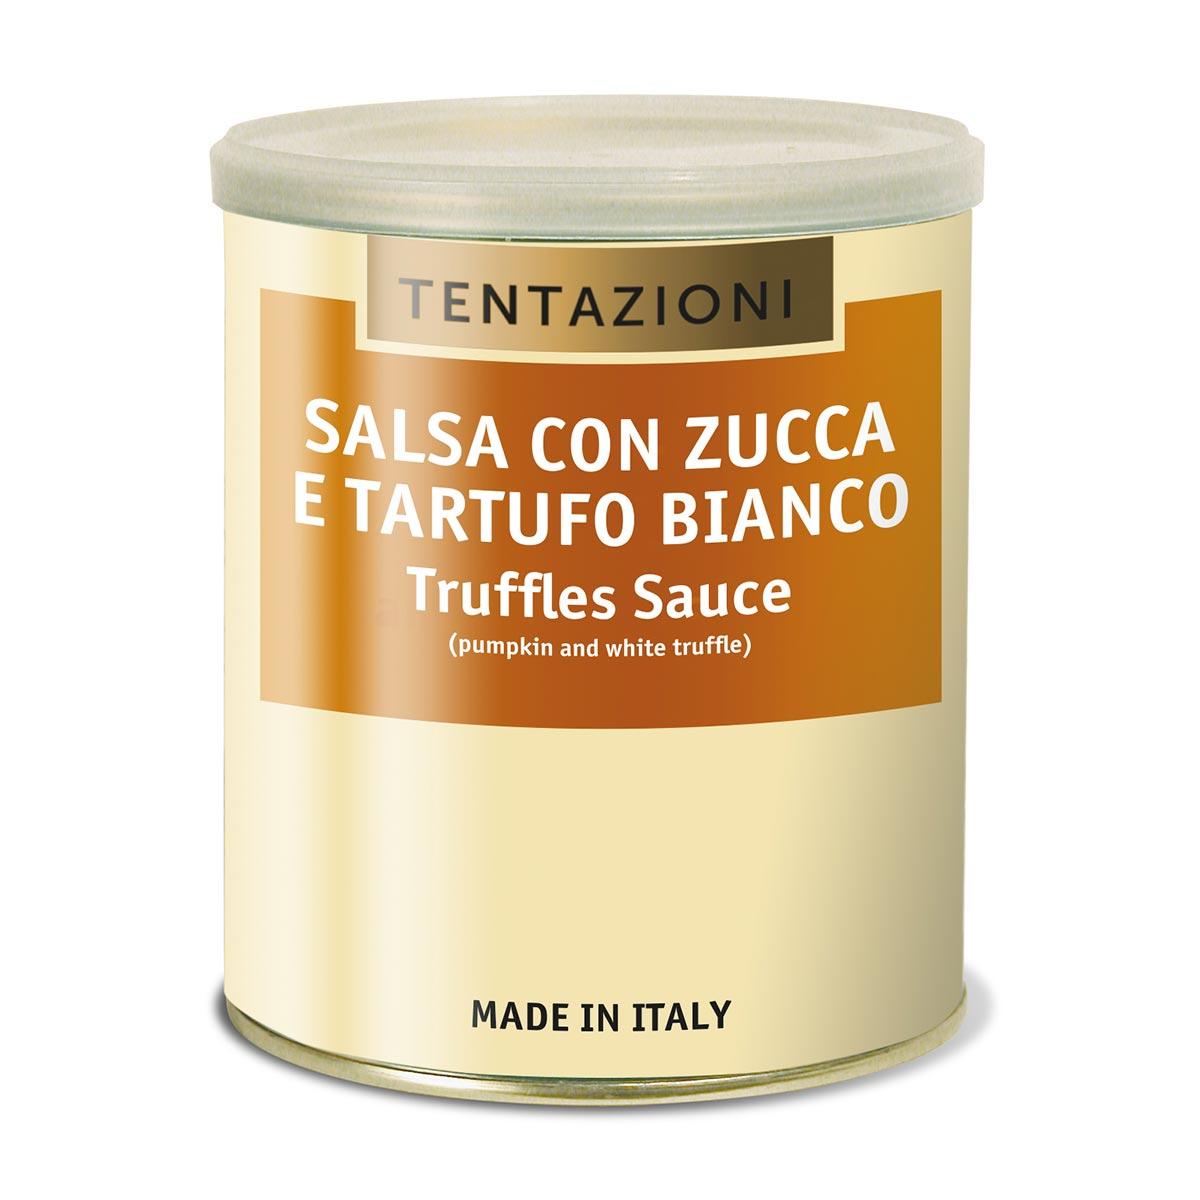 Salsa Con Zucca Al Tartufo Bianco Latta Da 800g